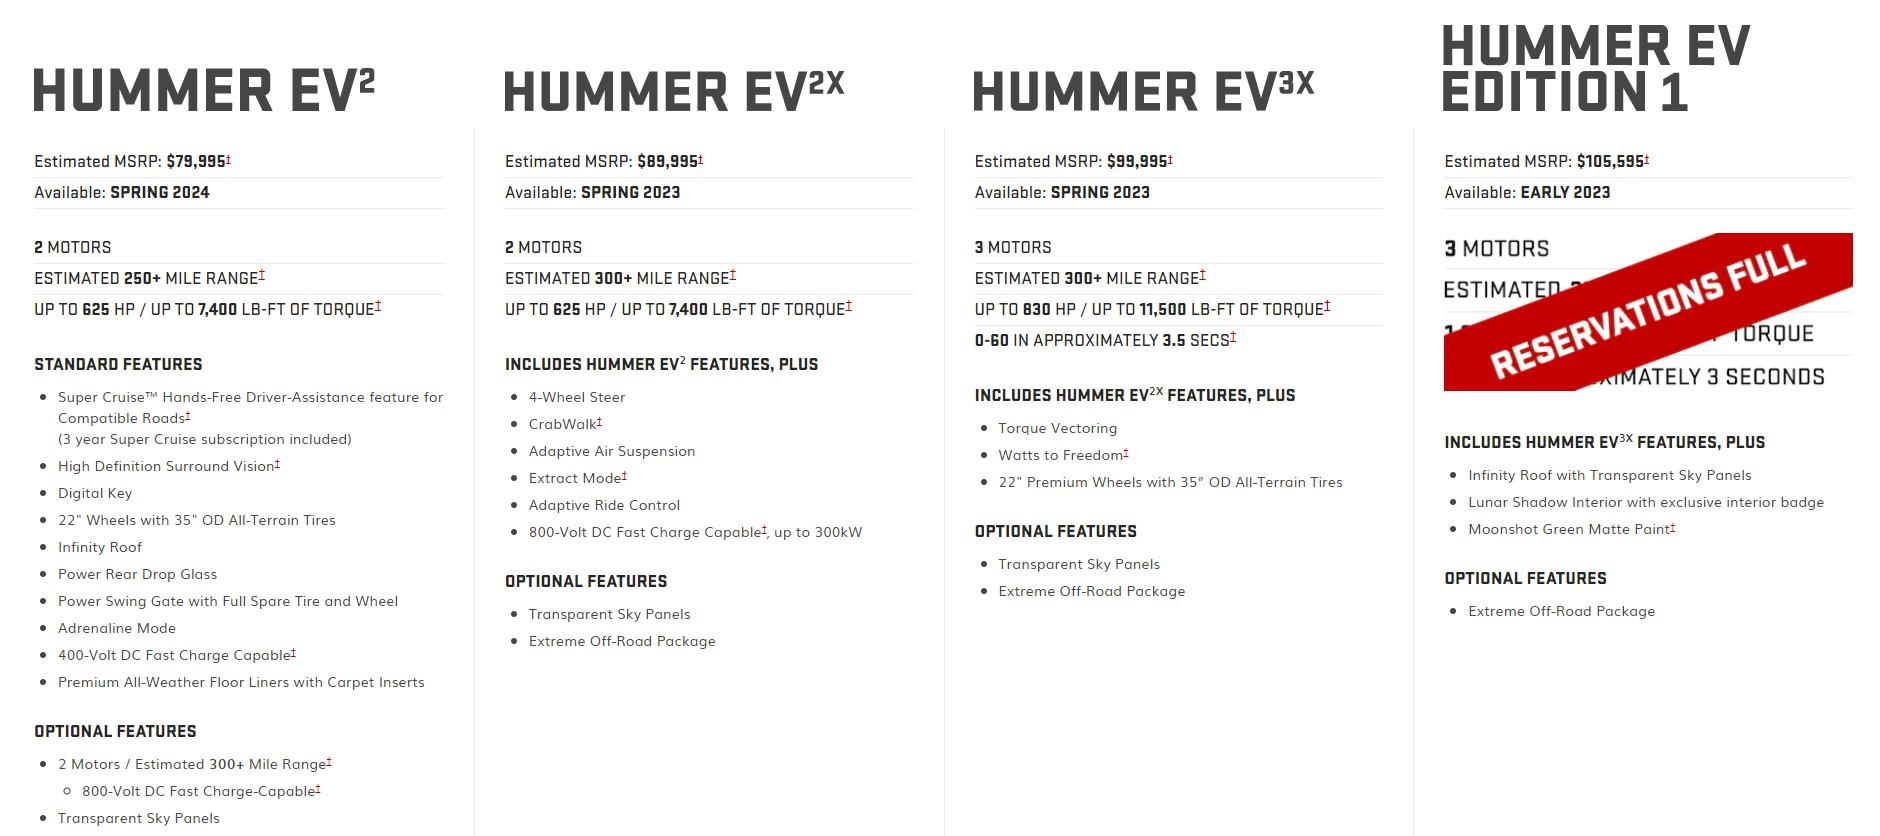 Hummer EV SUV specyfikacja i cena